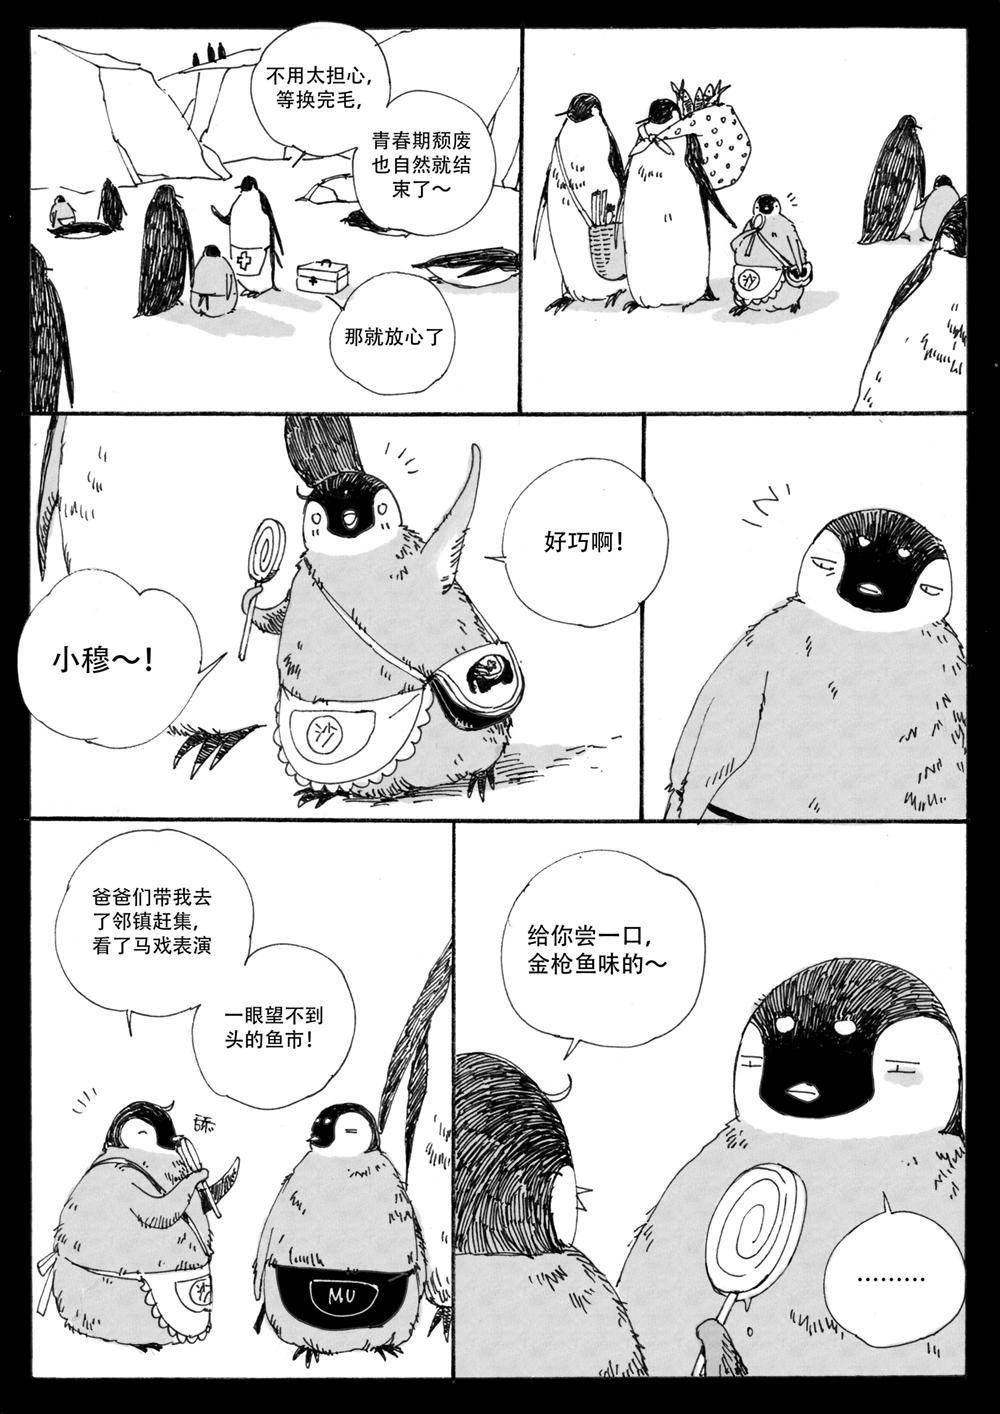 penguin28_1000